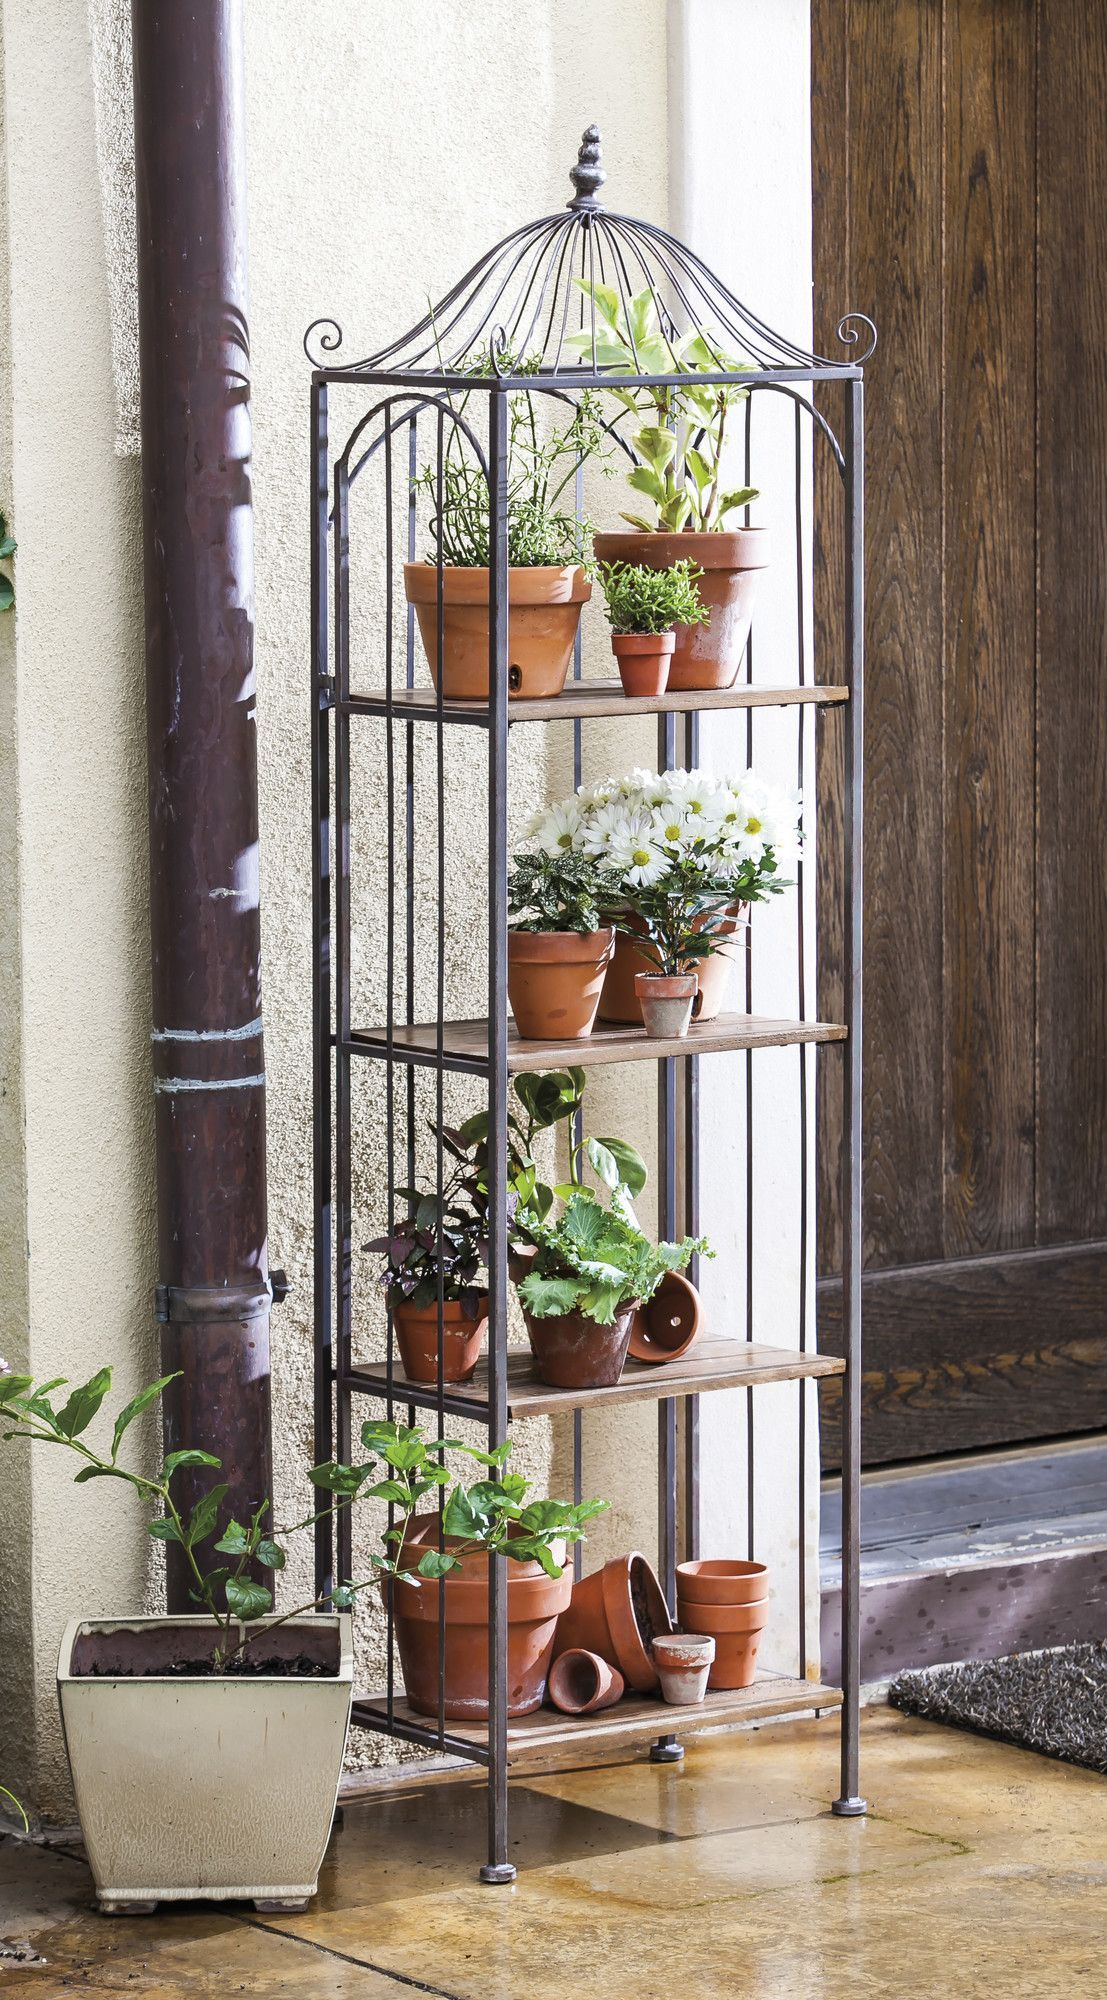 Bird Cage Metal And Wood Display Shelf Etagere Plant Stand Plant Stand Plants House Plants Decor